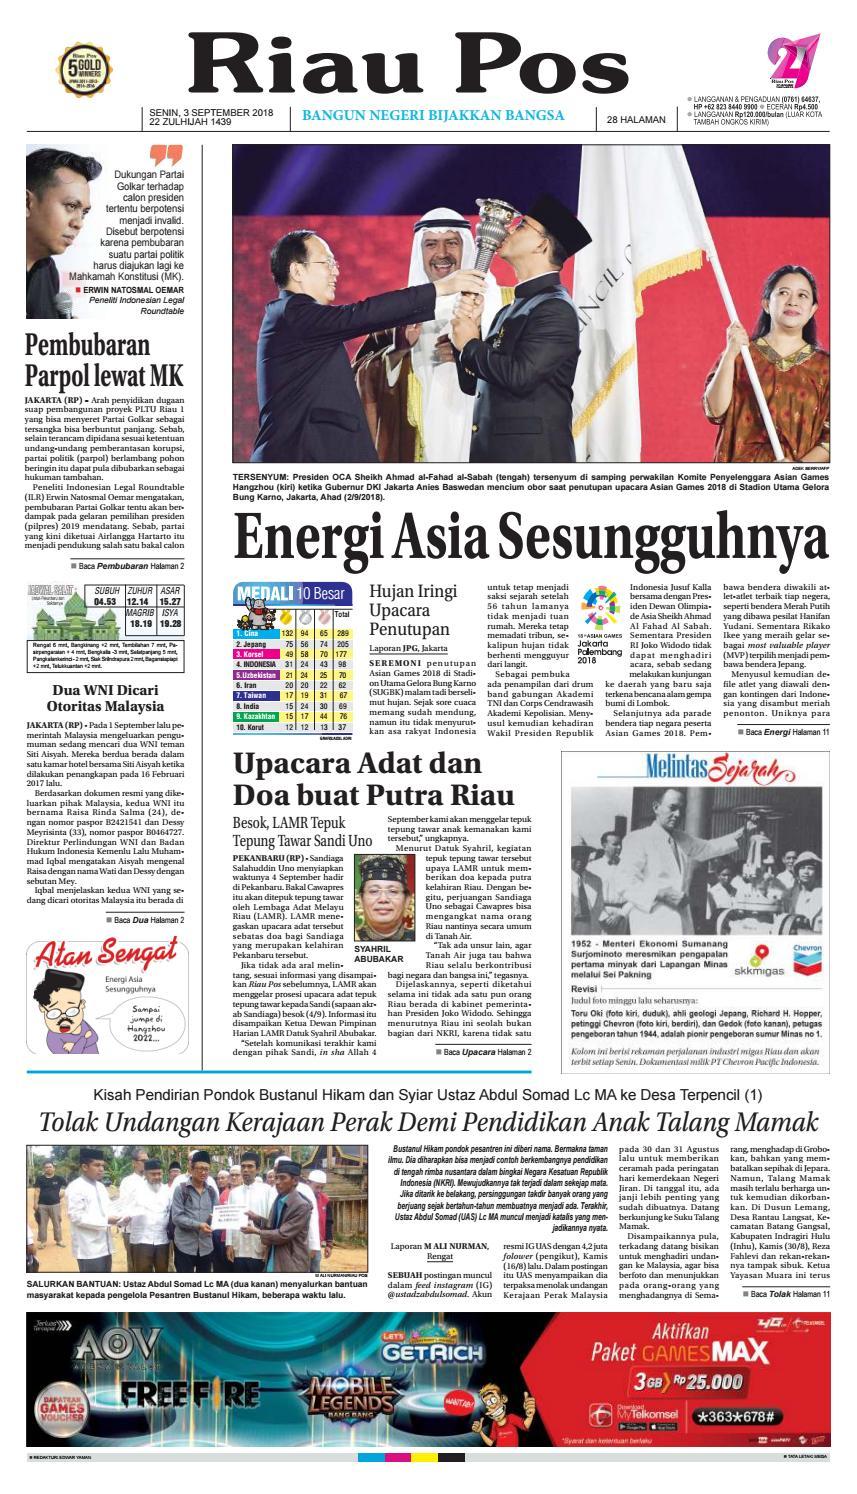 Riau Pos Edisi 3 September 2018 By Issuu Produk Umkm Bumn Lapis Surabaya Panjang Hj Enong